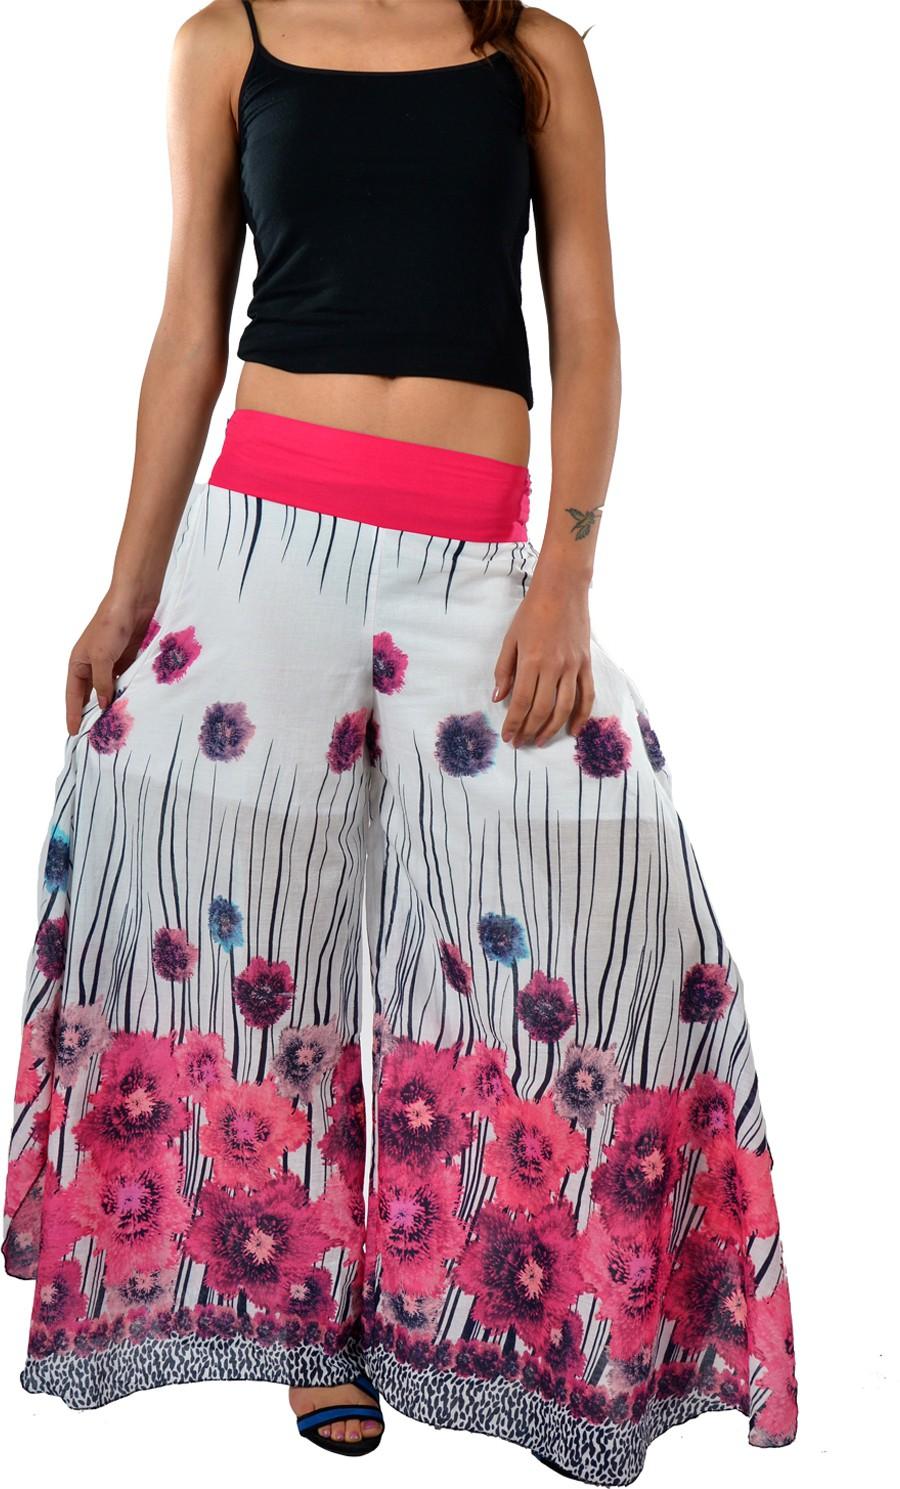 Striyah Couture Floral Print Cotton Womens Harem Pants